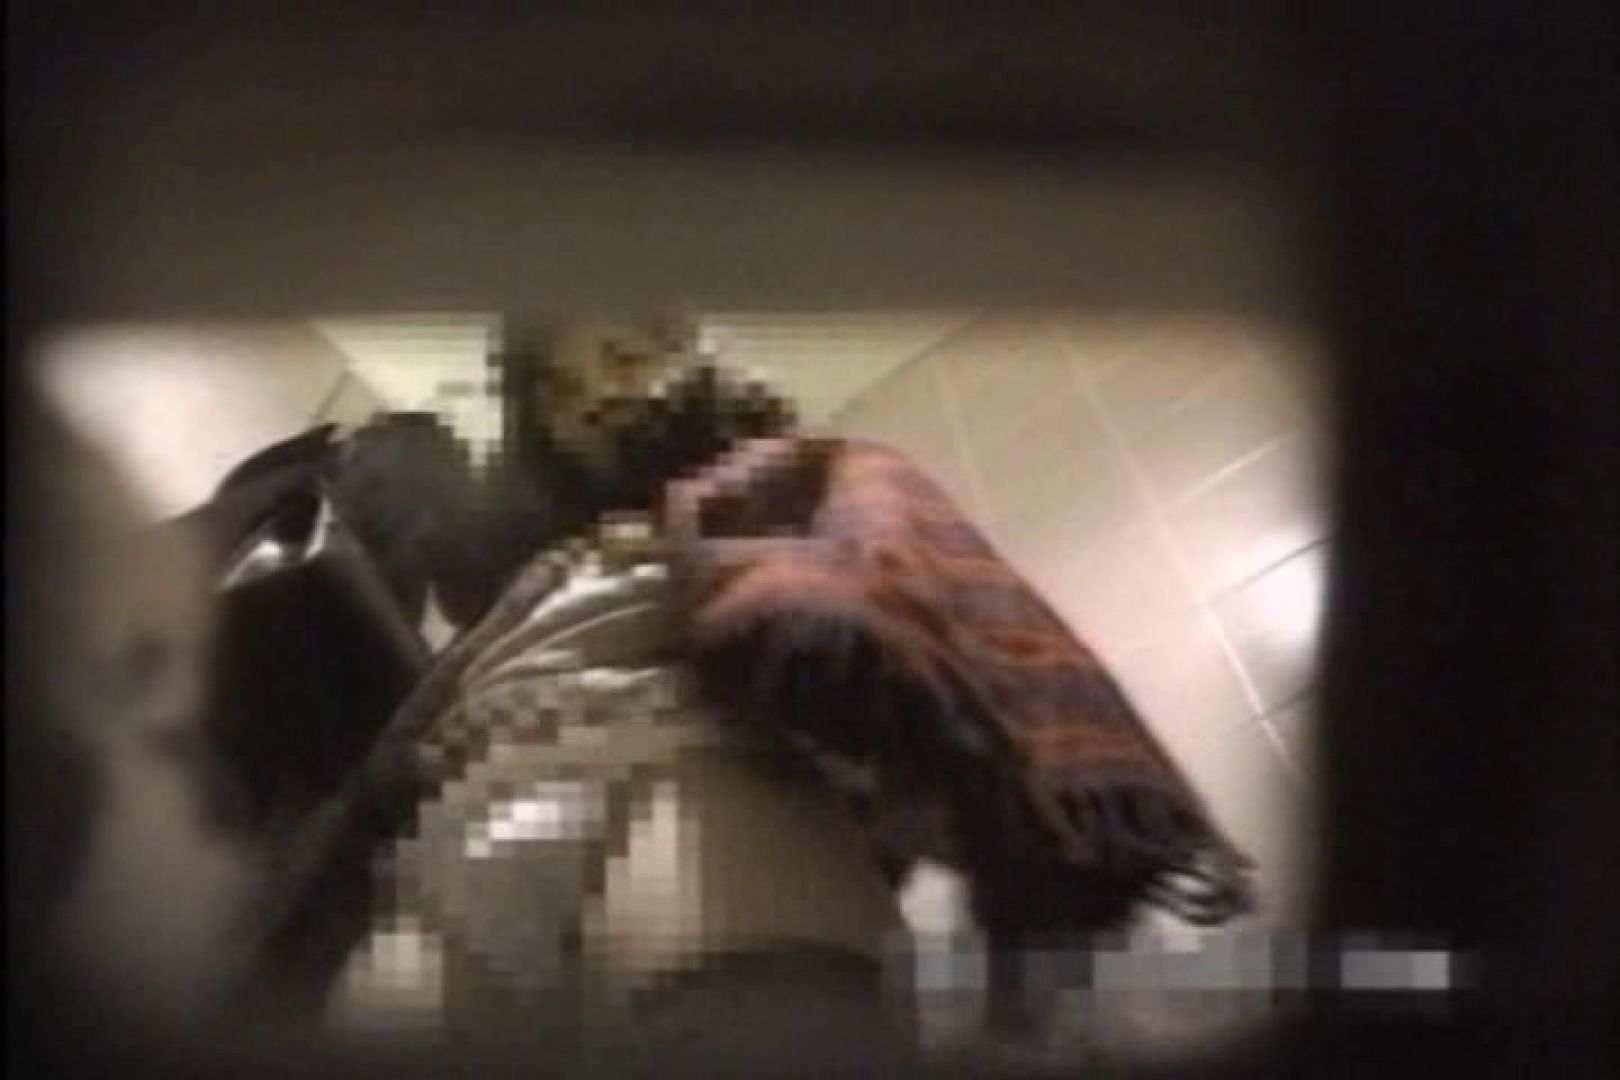 STY-013 実録!2カメde女子洗面所 接写 おまんこ無修正動画無料 113pic 43